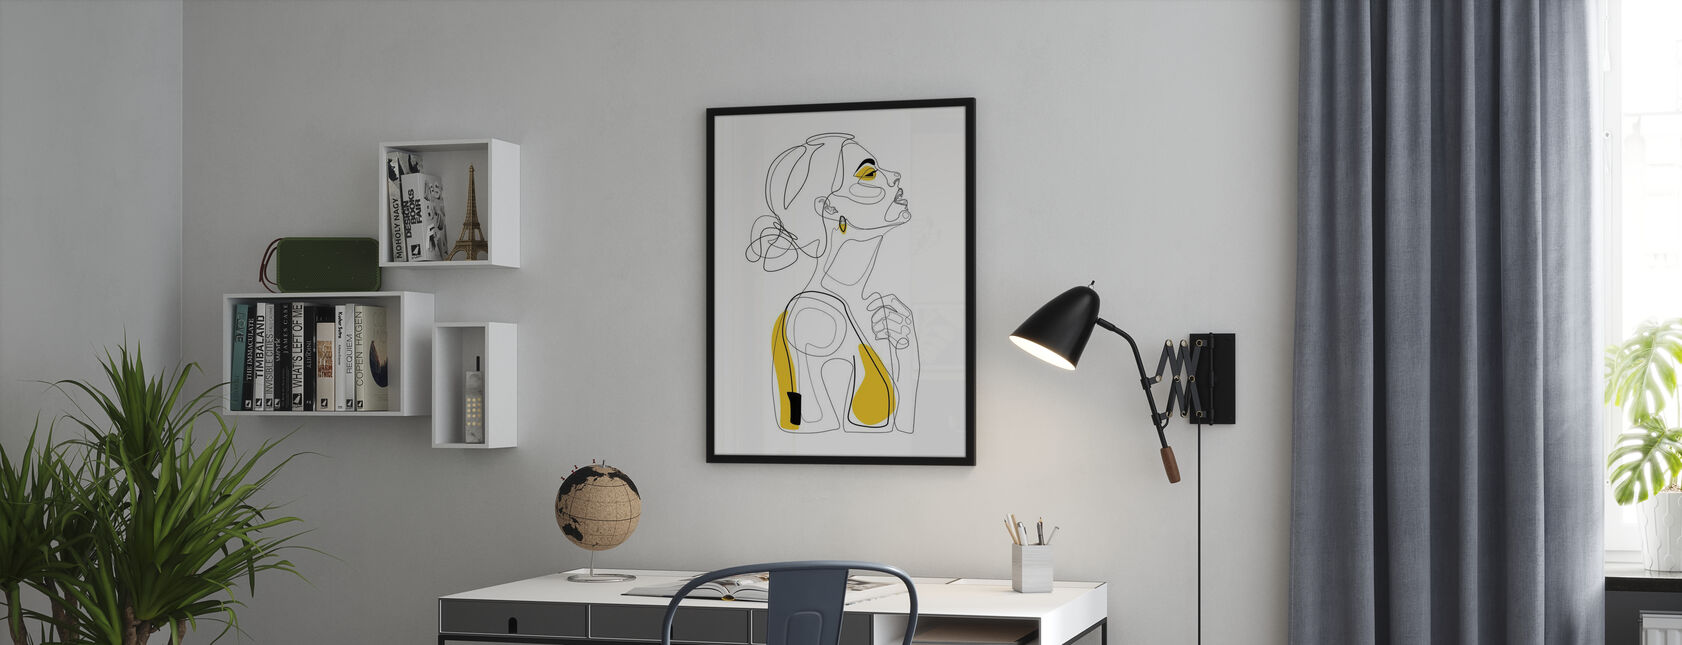 Kleur Schoonheid - Poster - Kantoor